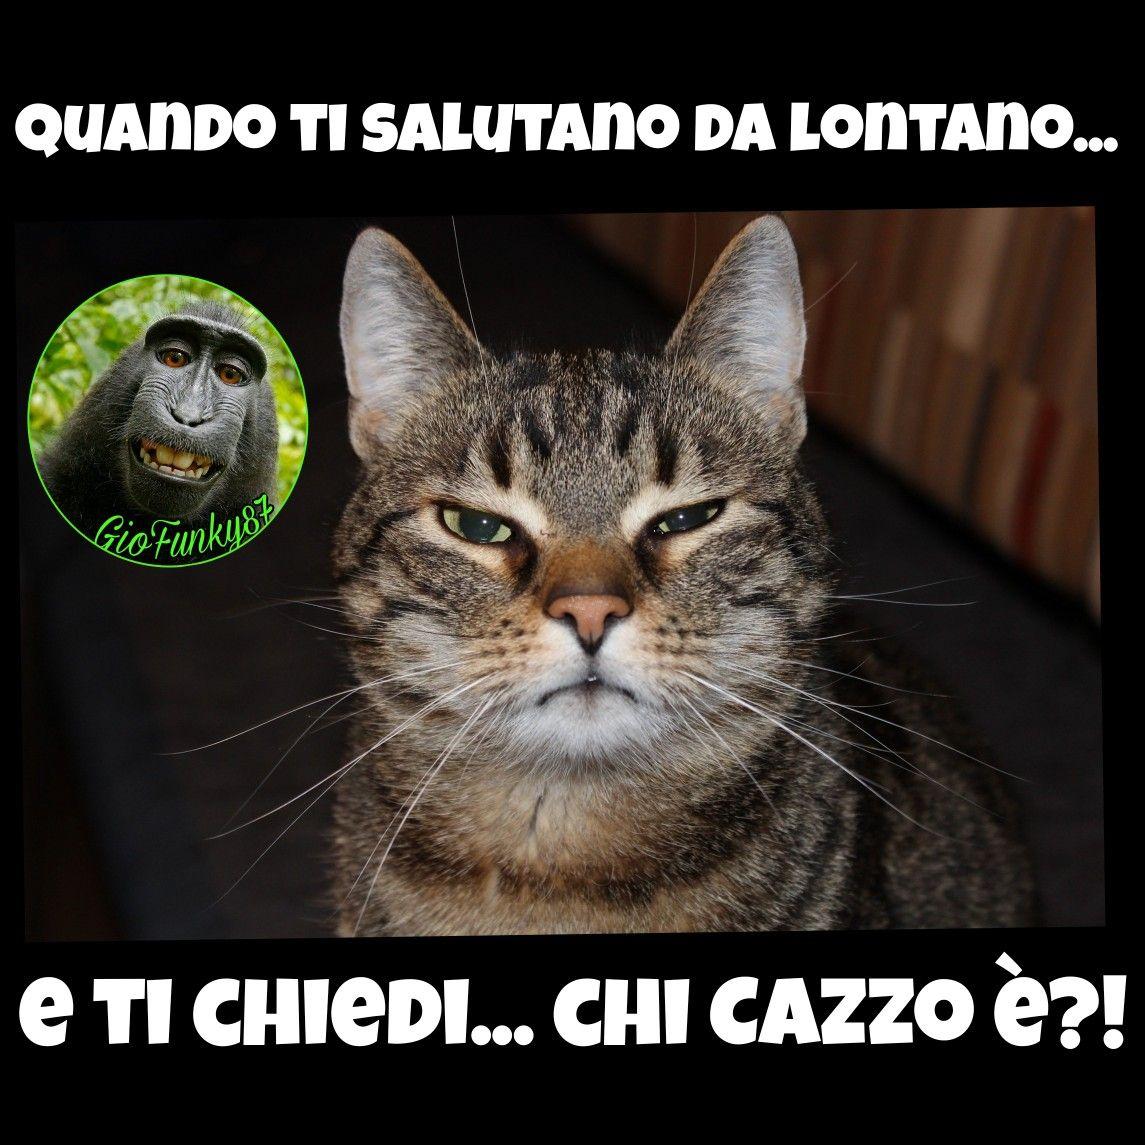 funny #joke #battute #risate #indovinelli #humor #battute  #immaginidivertenti #divertente #ri… | Immagini divertenti, Manifesti  divertenti, Vignette su gatti buffi